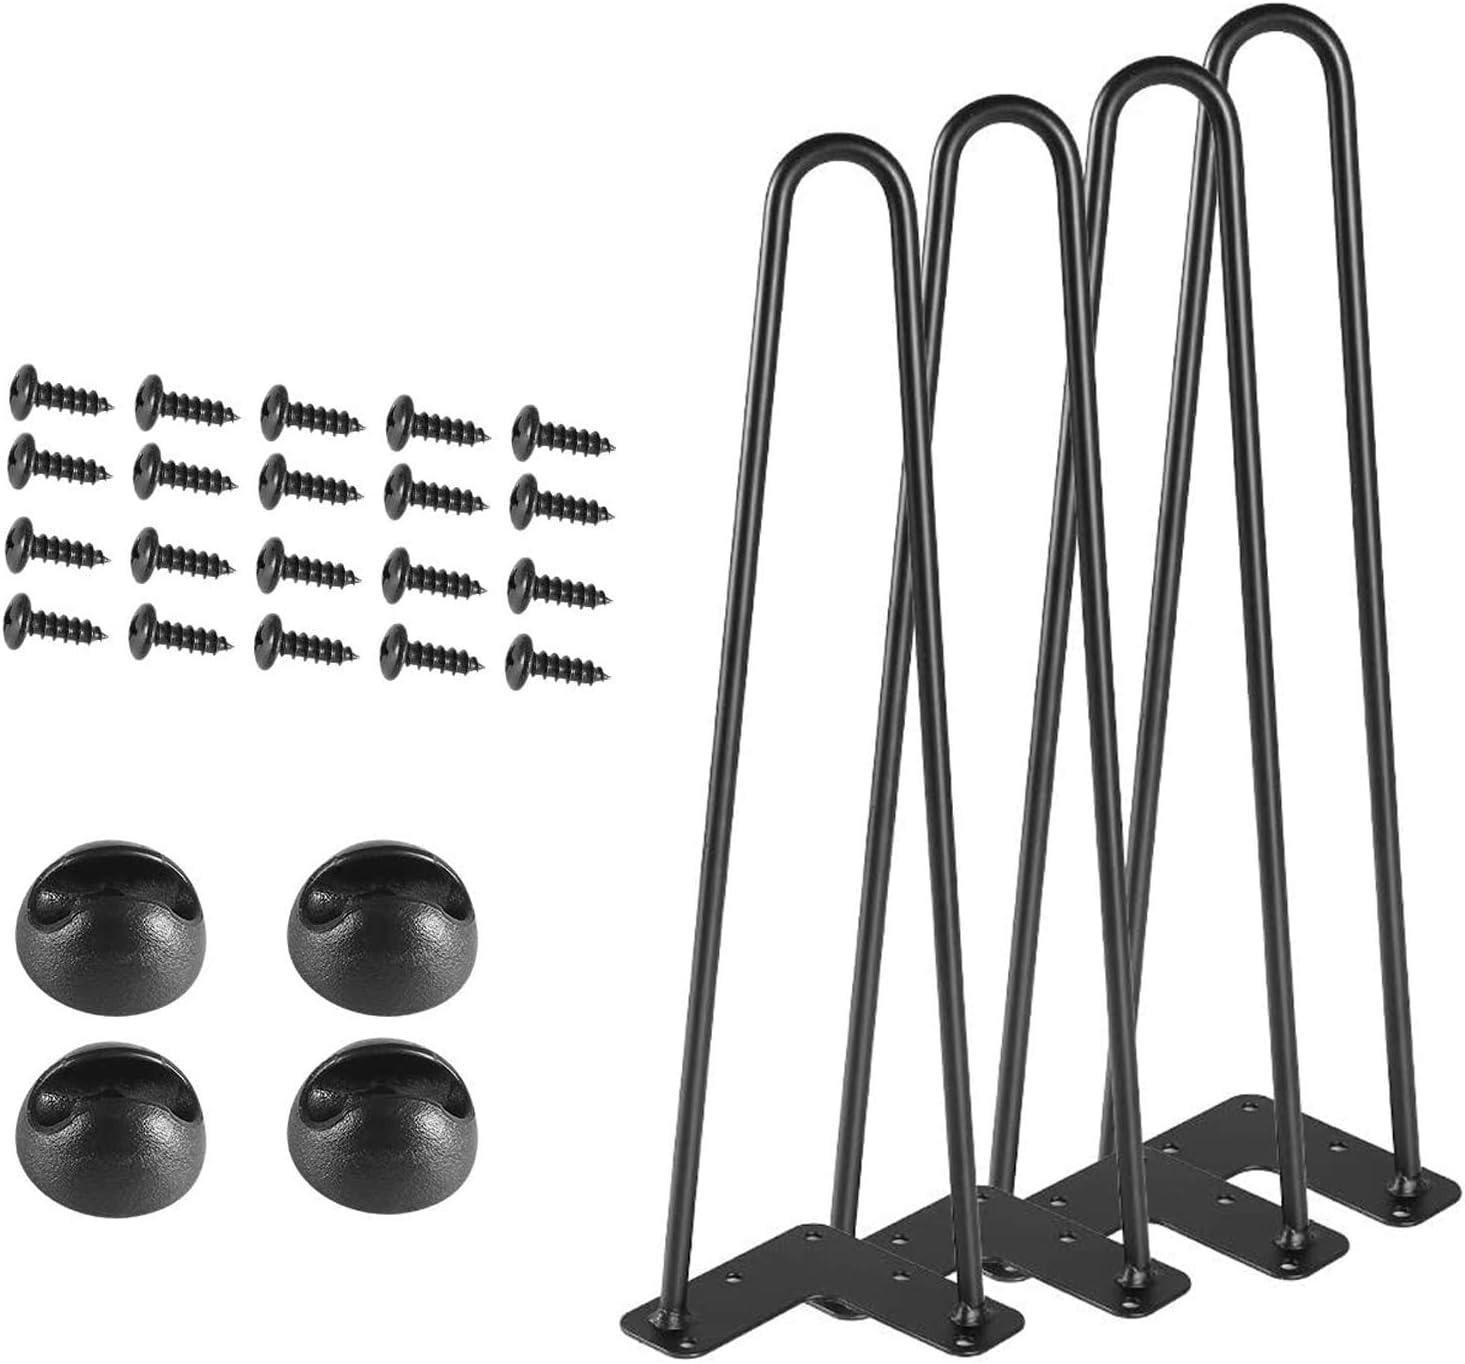 Sanbo Hairpin Table Legs,16in Set of 4, DIY Furniture Metal Coffee Table Leg,3/8in Diameter Satin Black 2-Rod Mid Century Modern Style